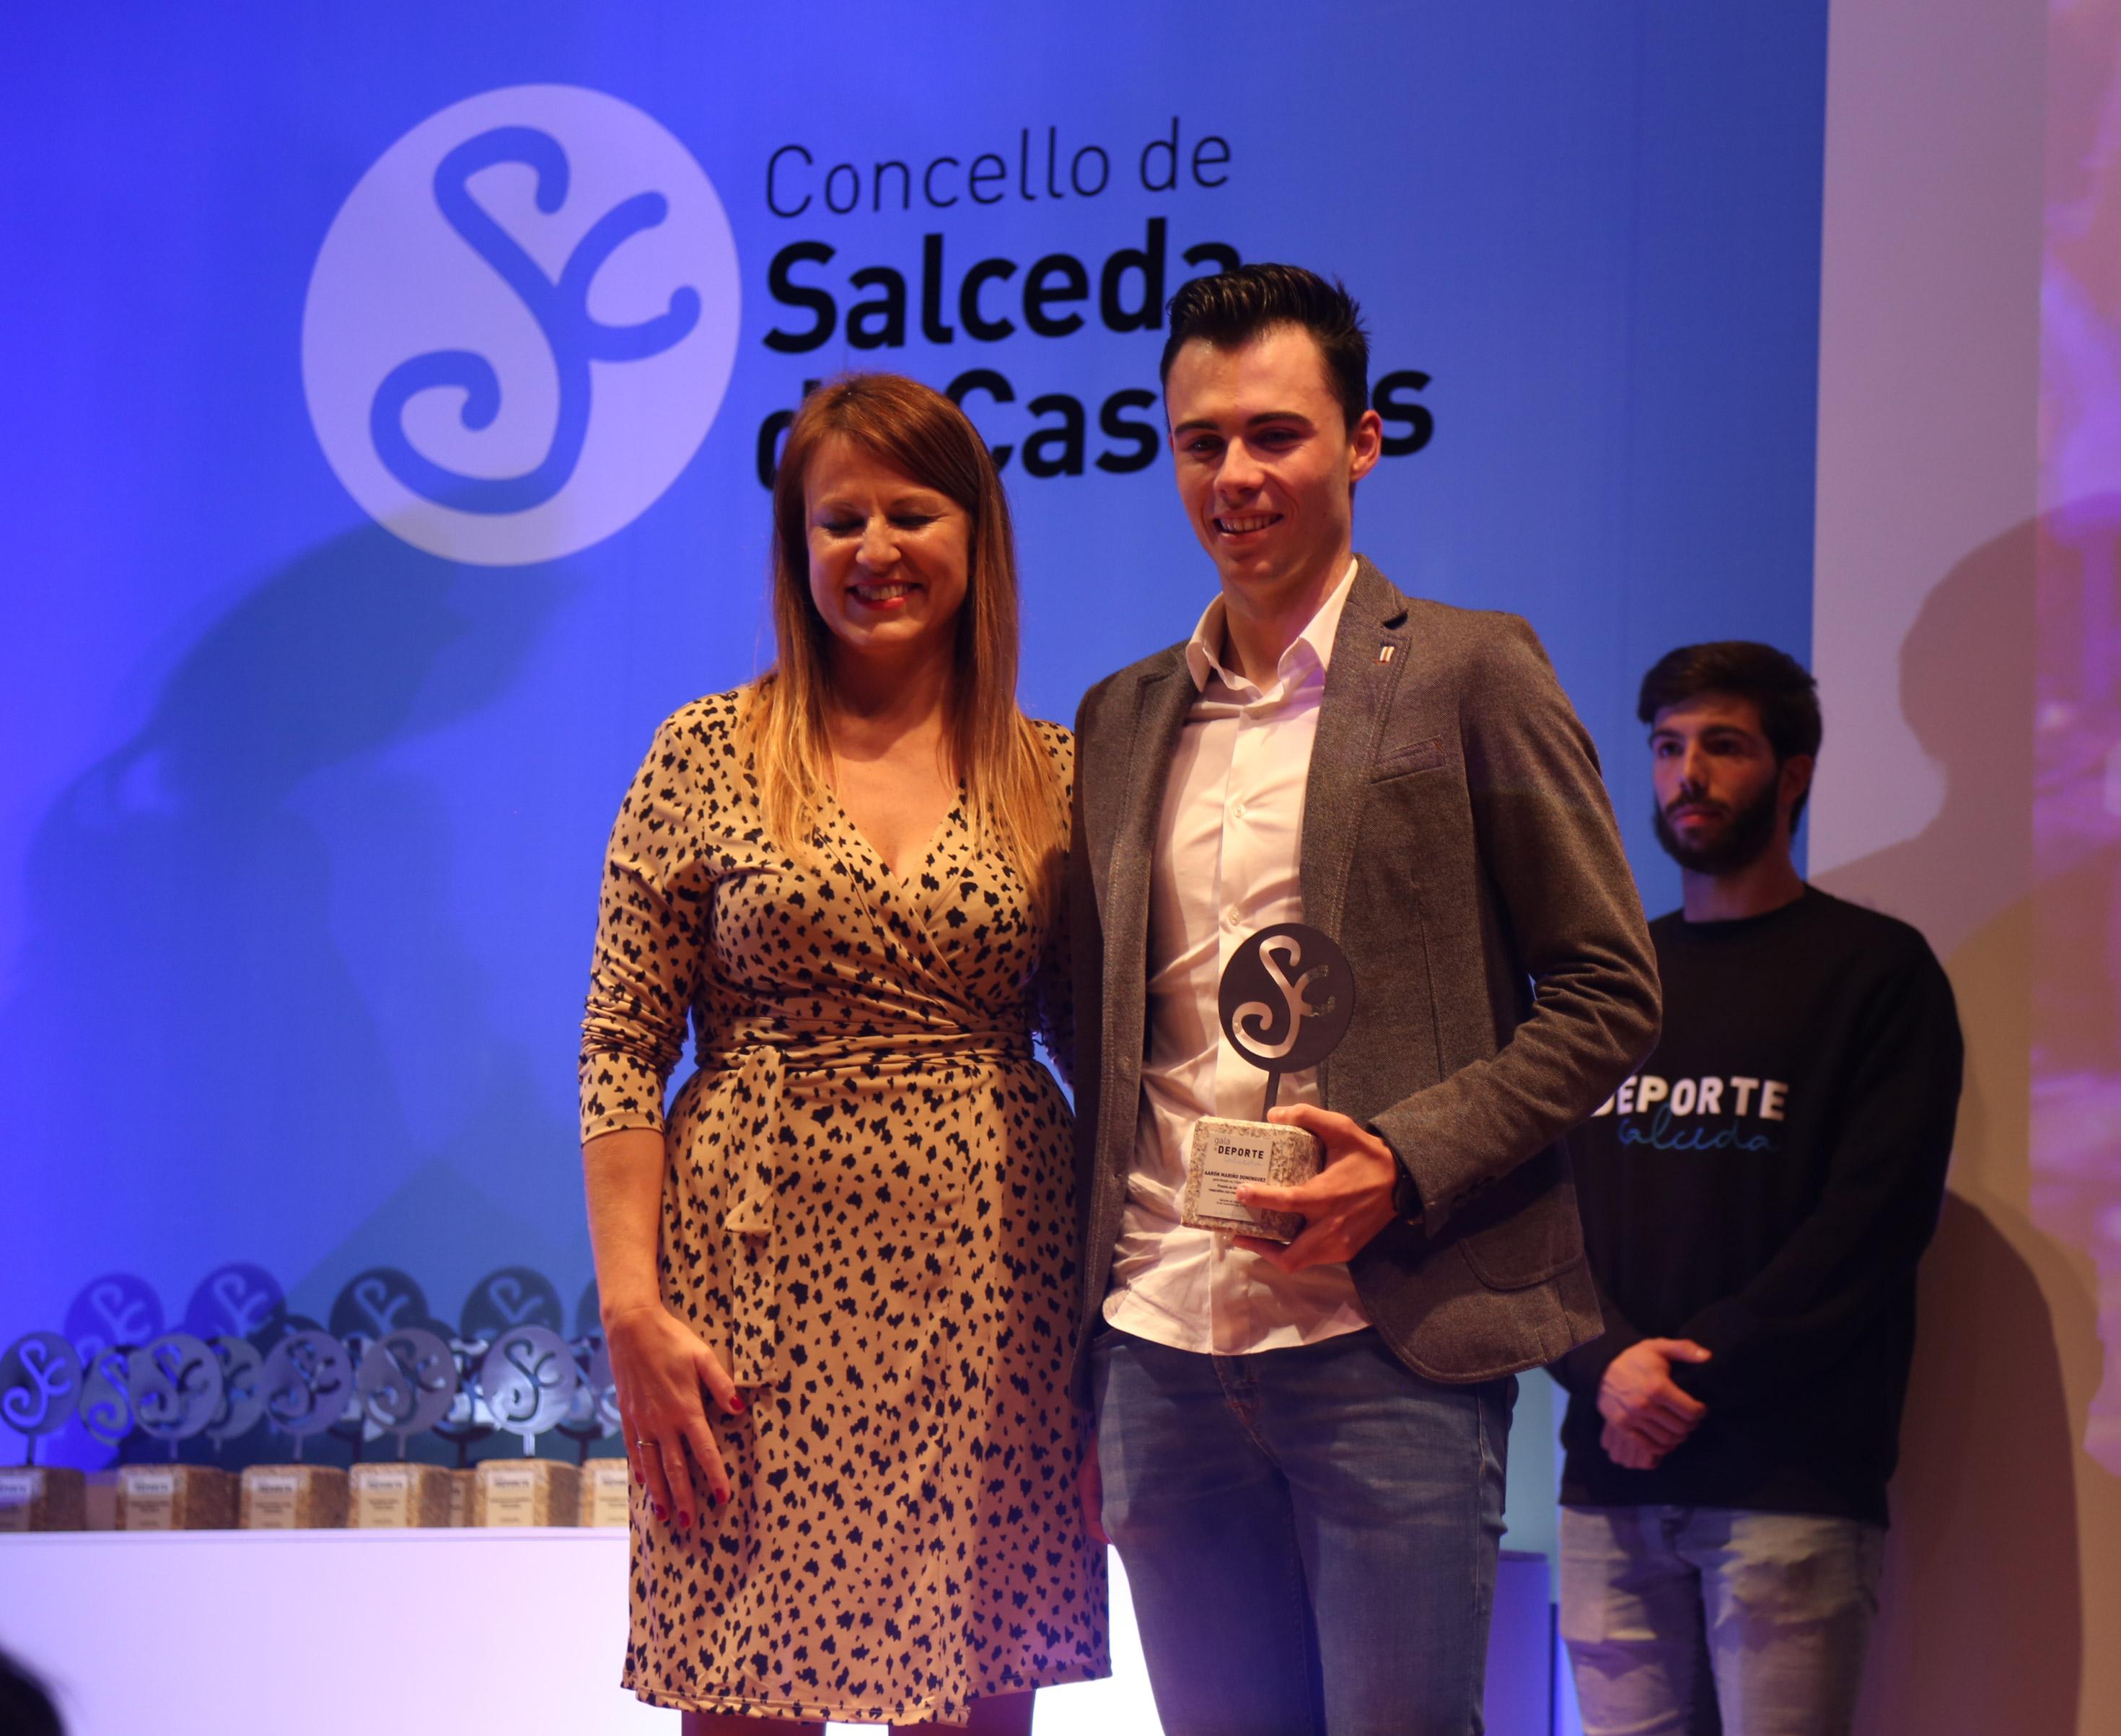 Premiados evento I Gala do Deporte del Concello de Salceda